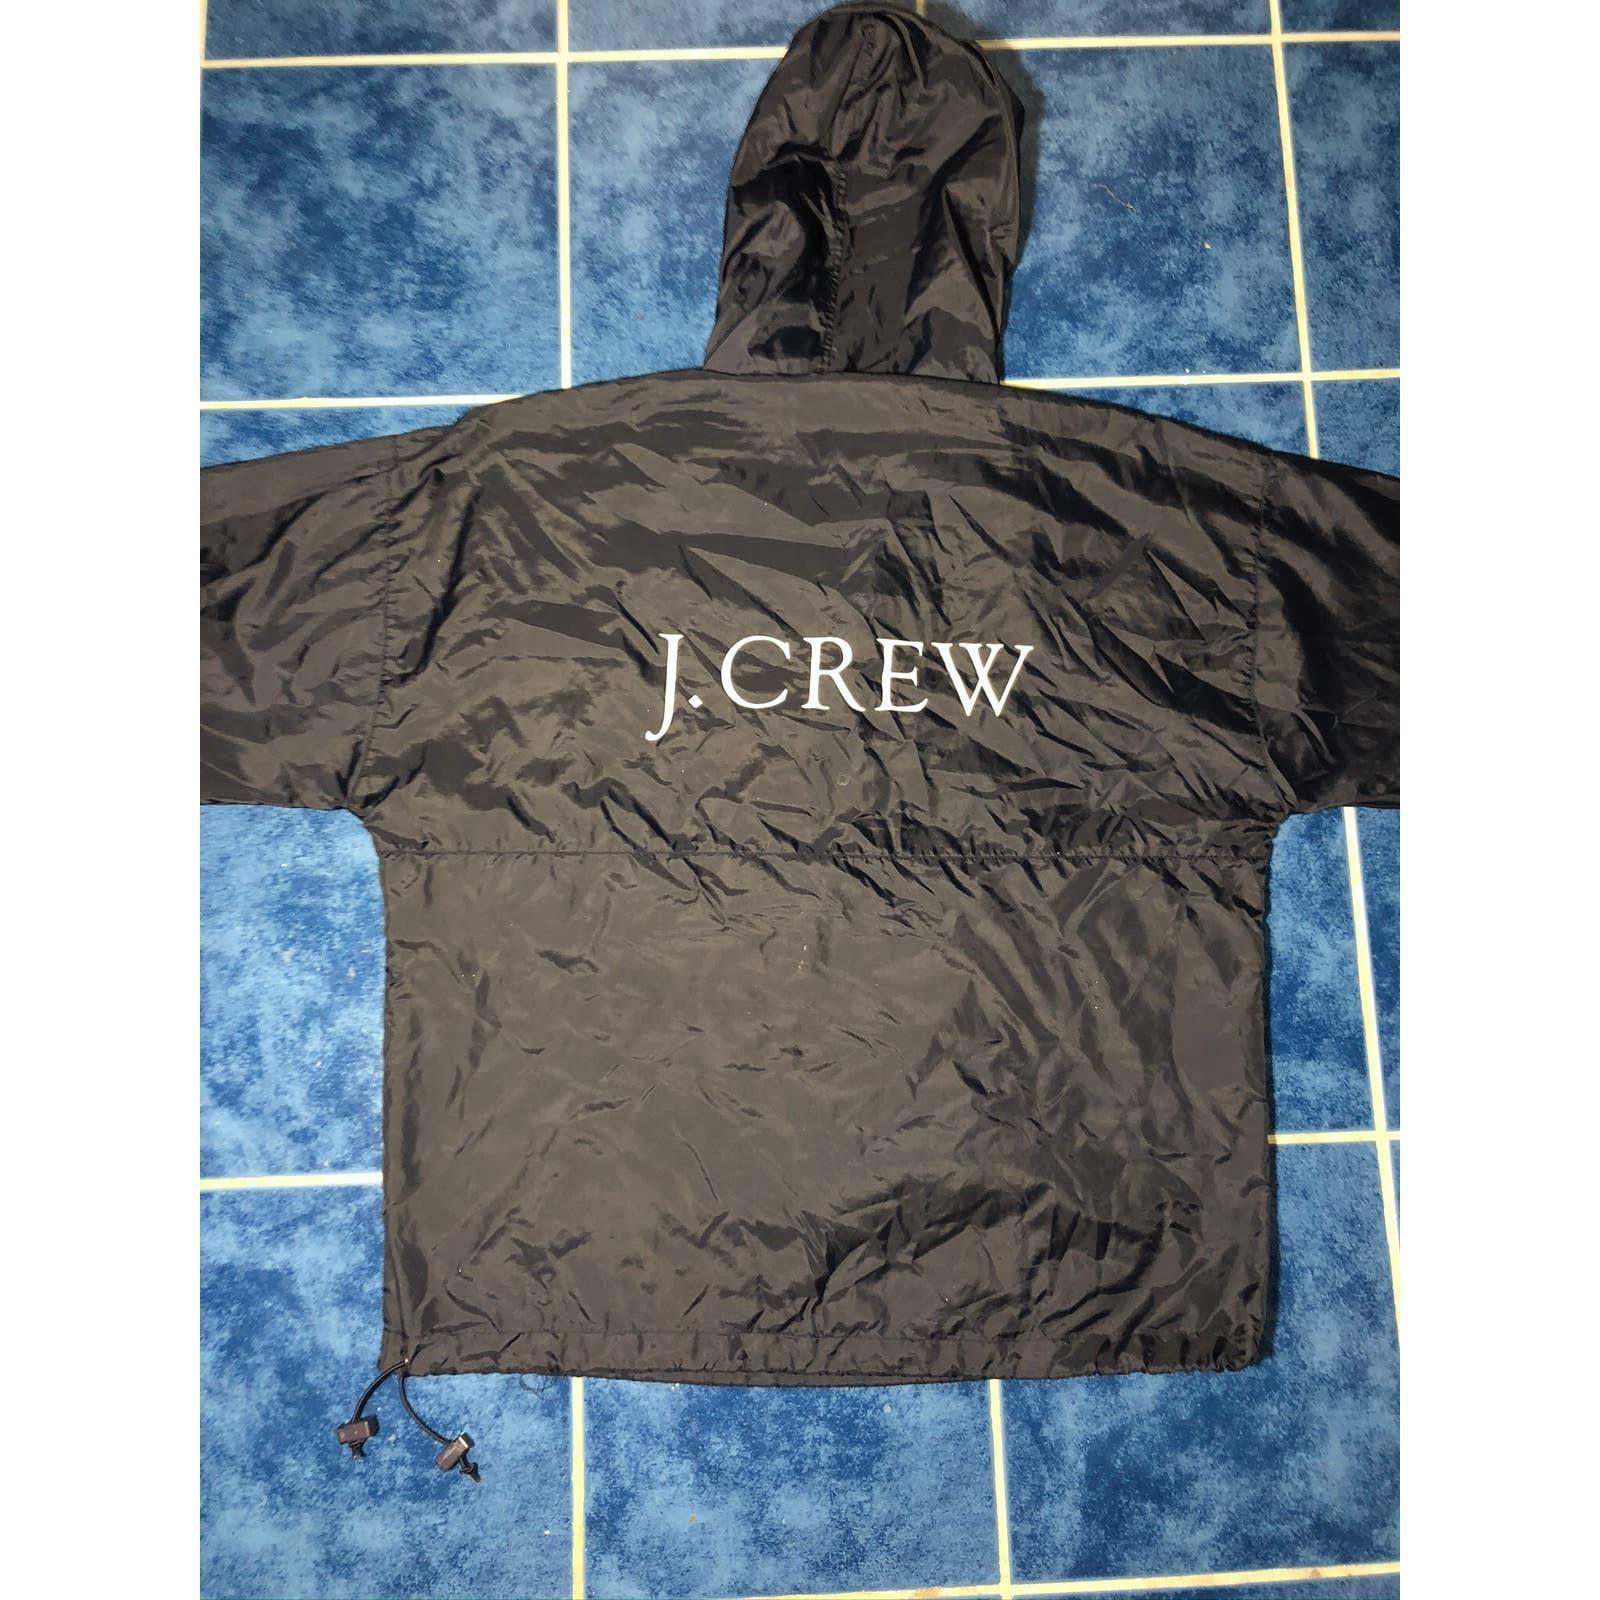 J.Crew half zipper windbreaker jacket.